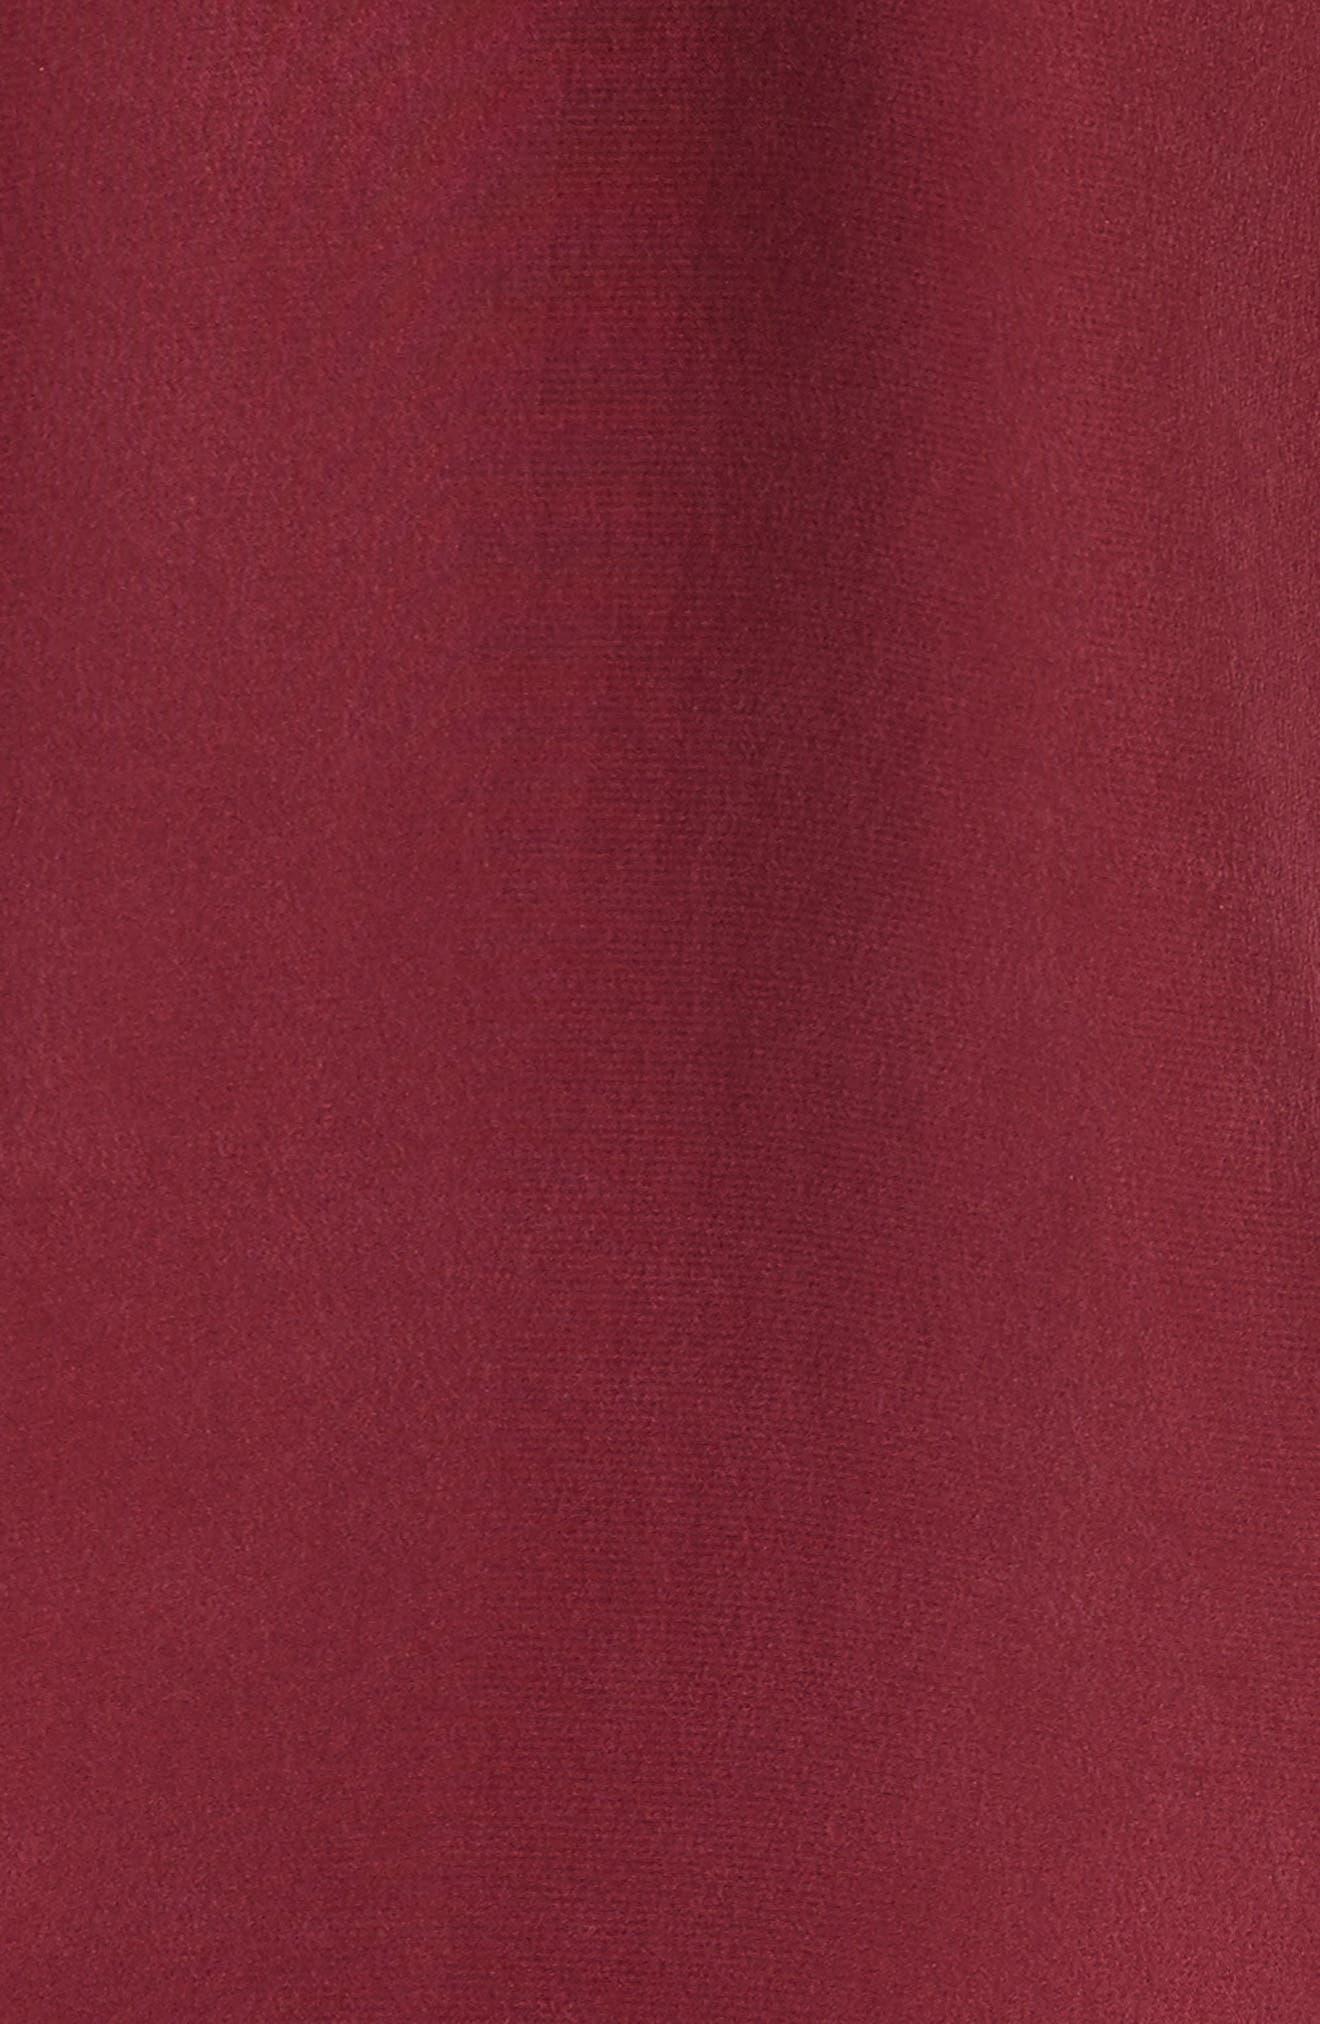 Drape Silk Satin Cami,                             Alternate thumbnail 7, color,                             Wine